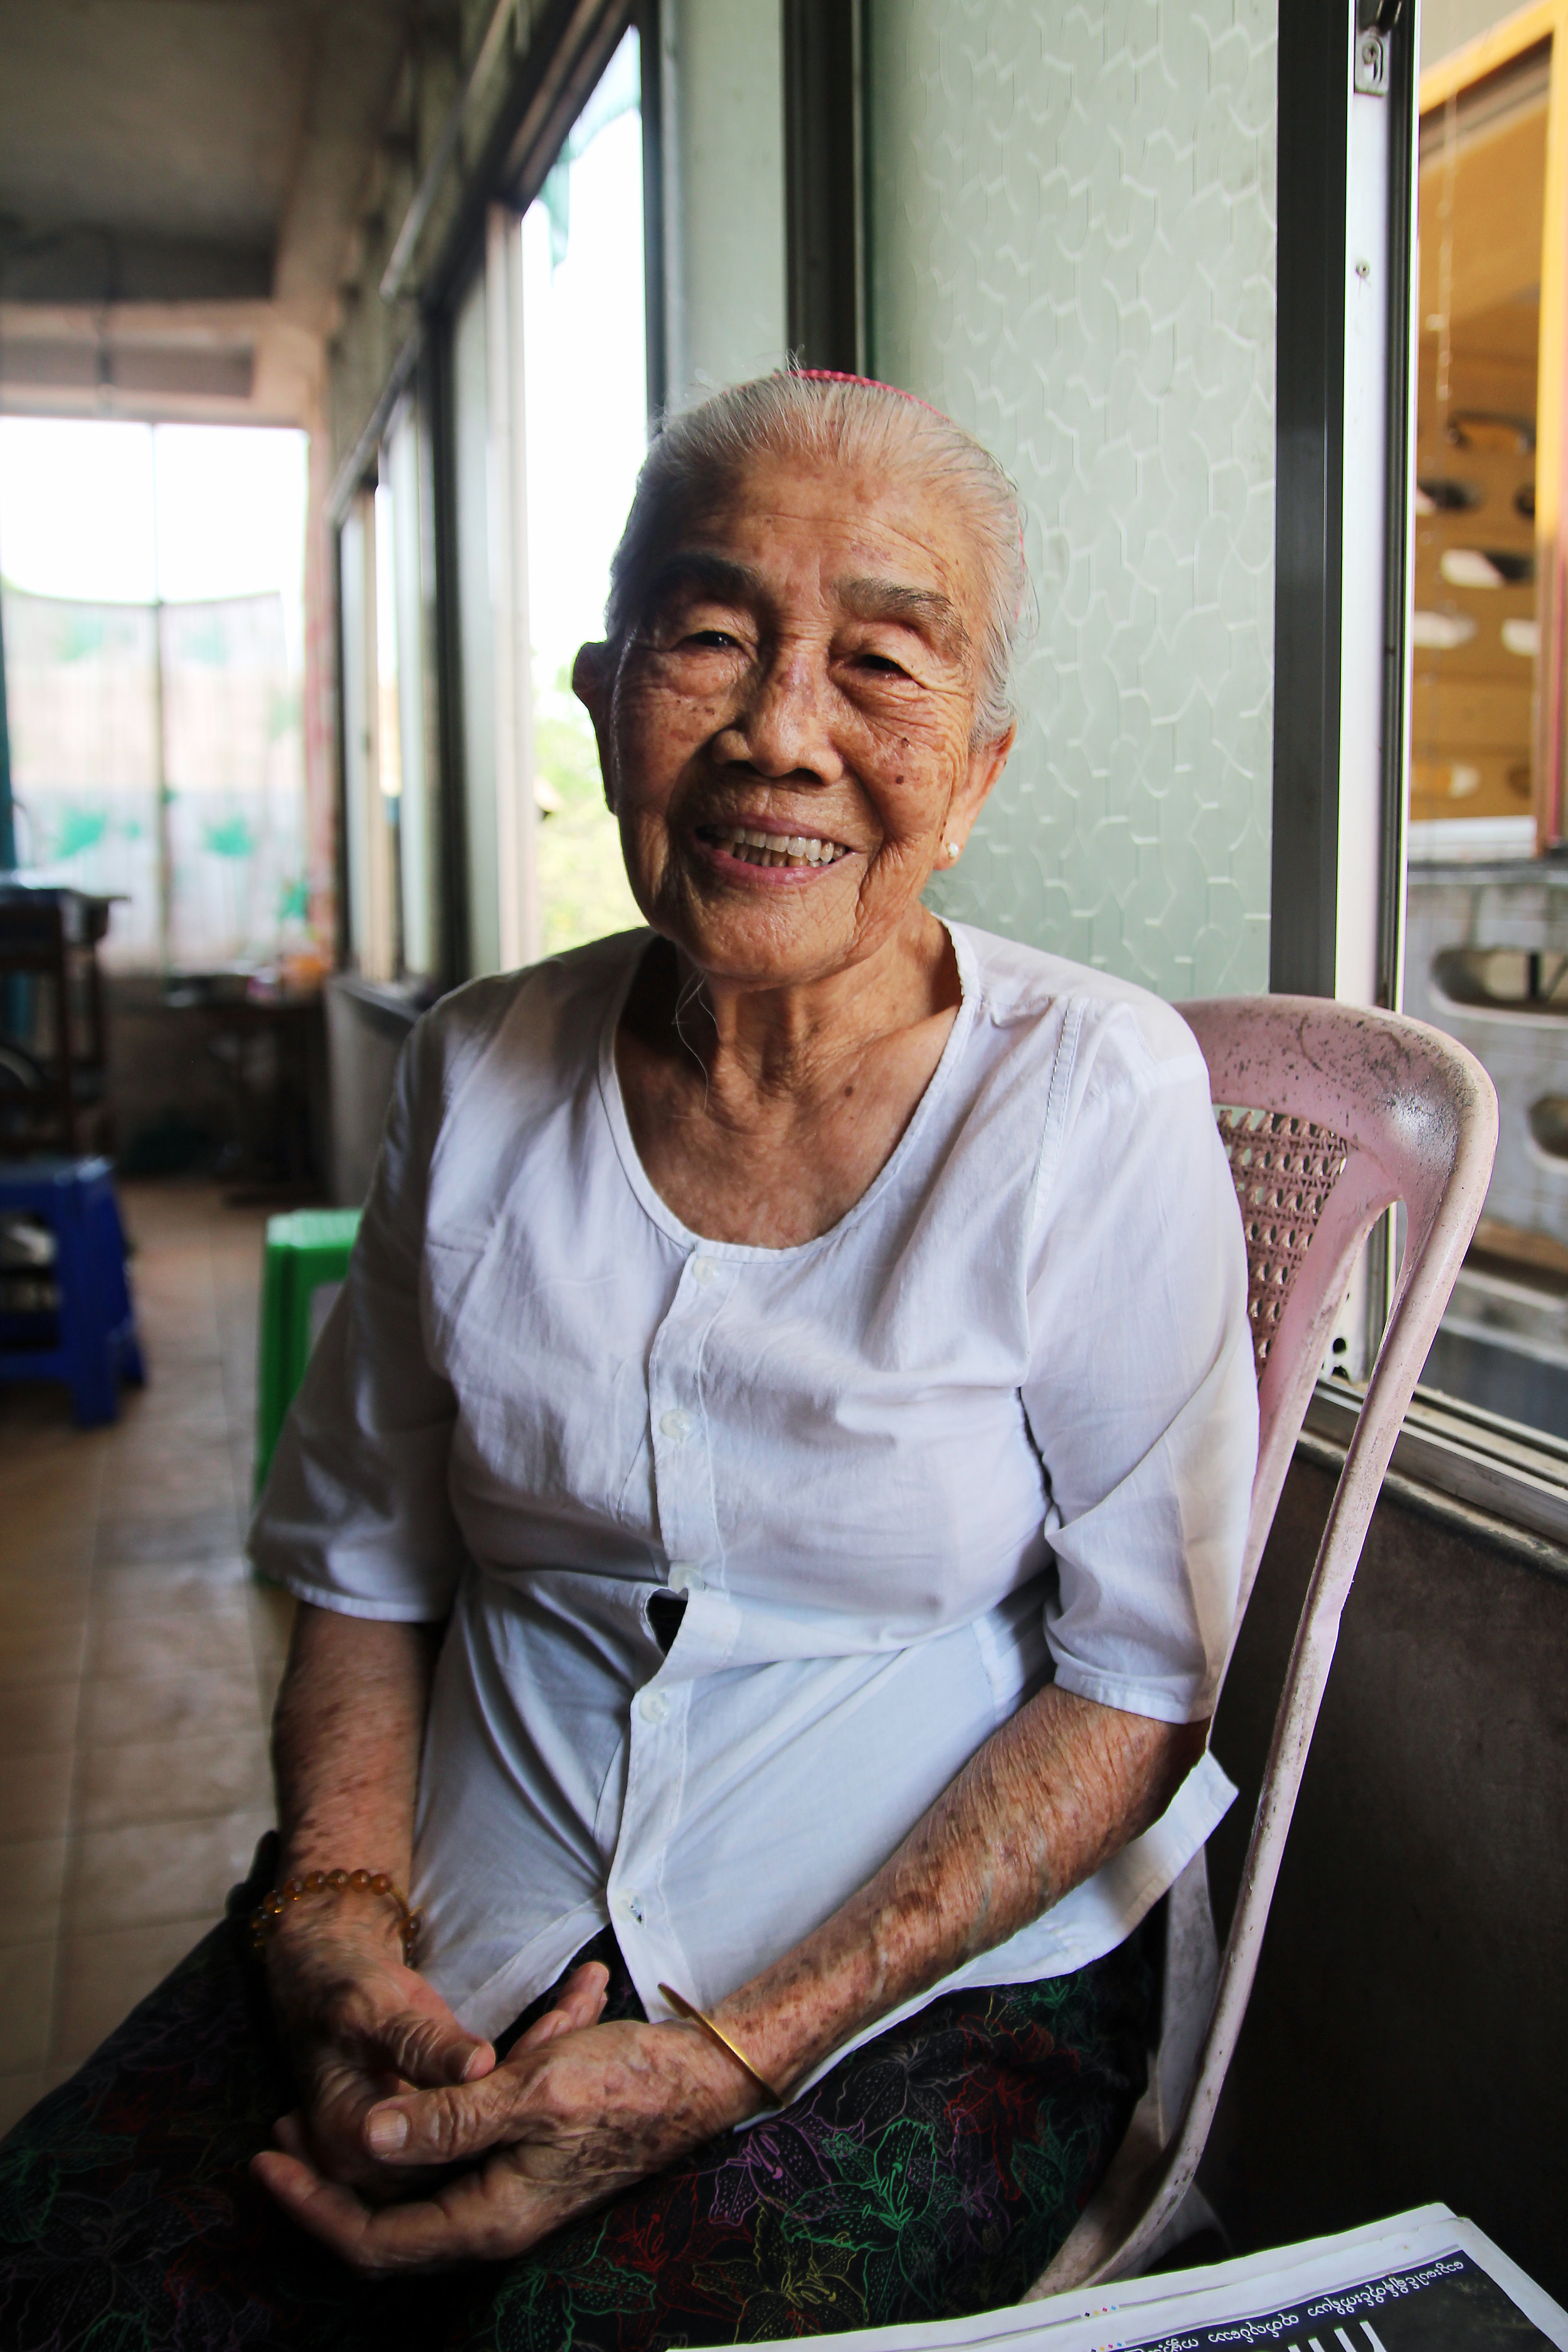 Yee Chung